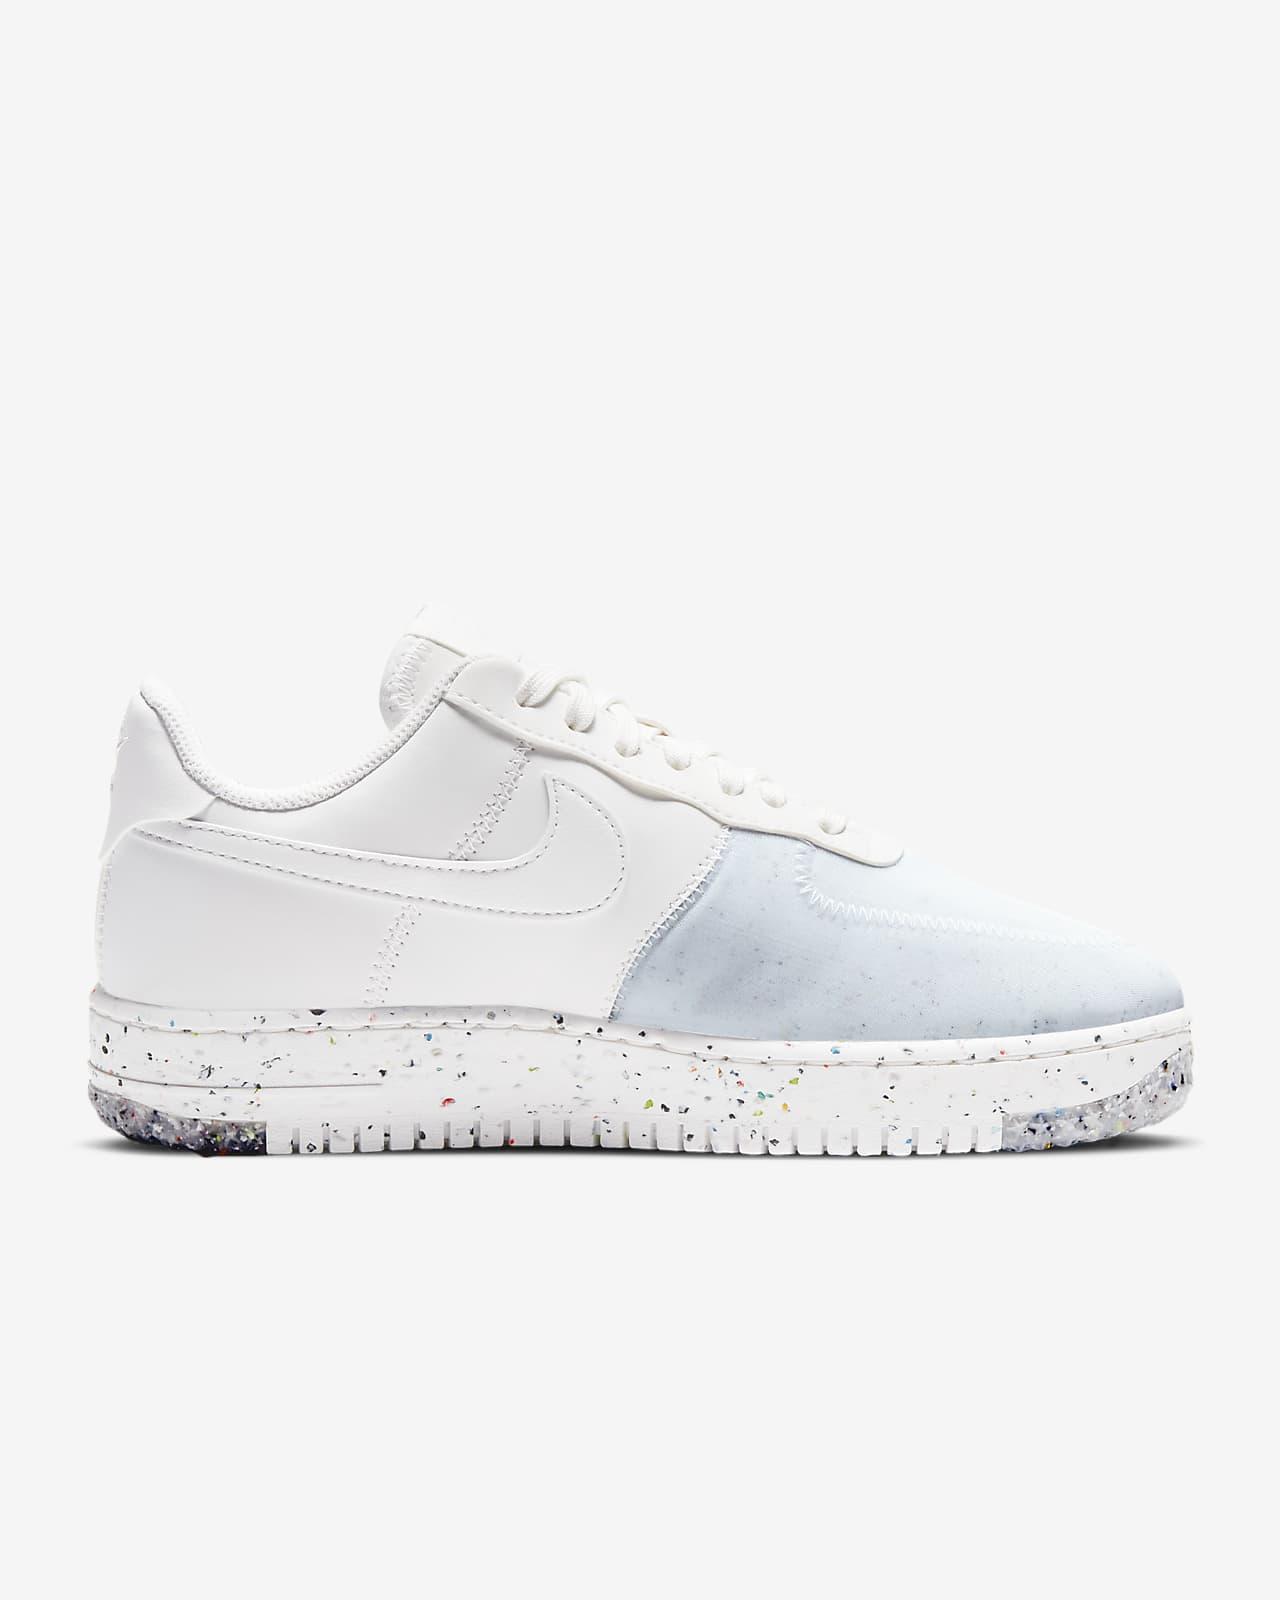 nike air force 1 chaussure